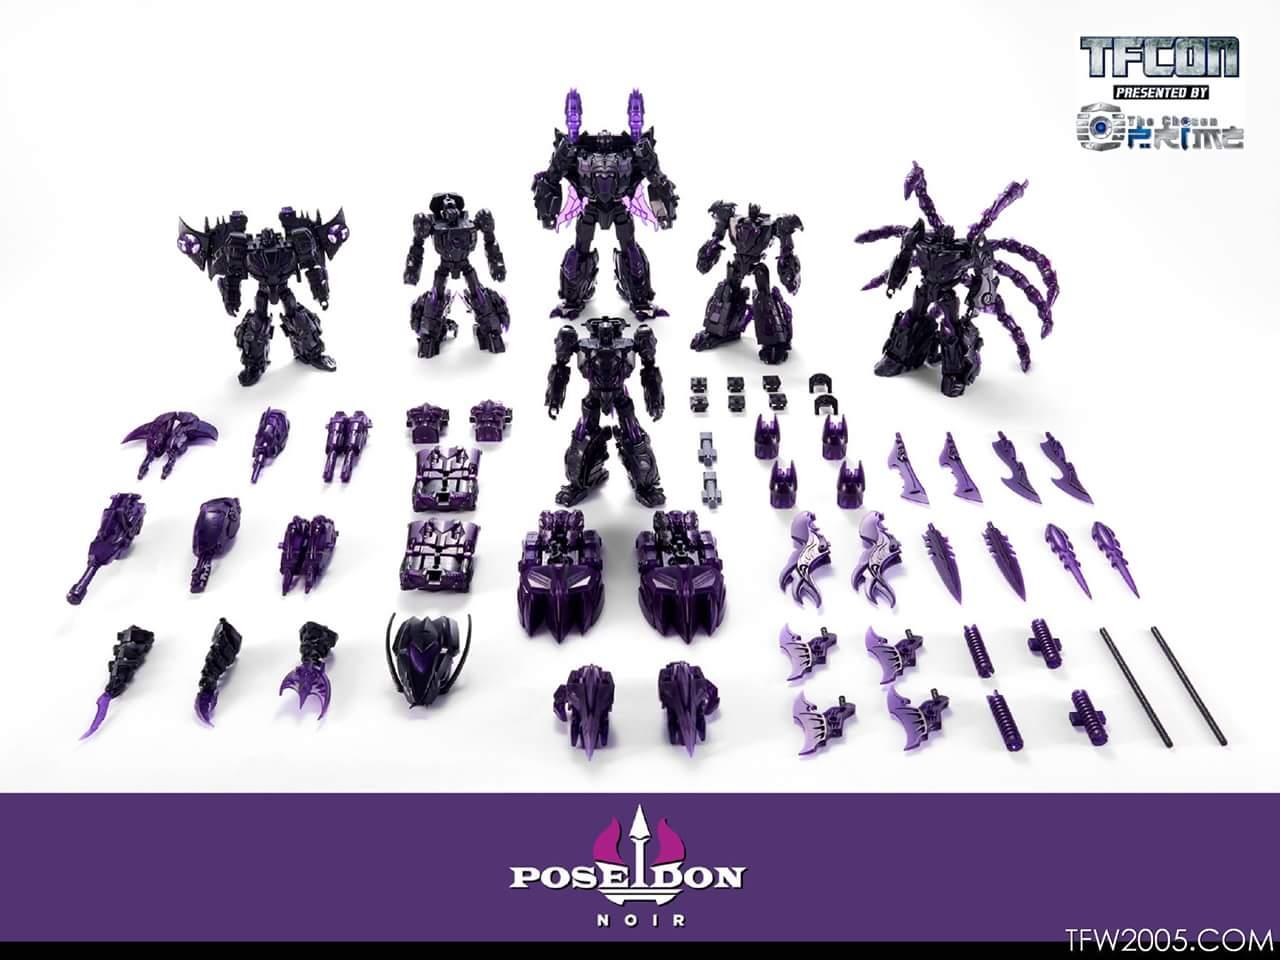 [TFC Toys] Produit Tiers - Jouet Poseidon - aka Piranacon/King Poseidon (TF Masterforce) - Page 6 991bP6aN_o